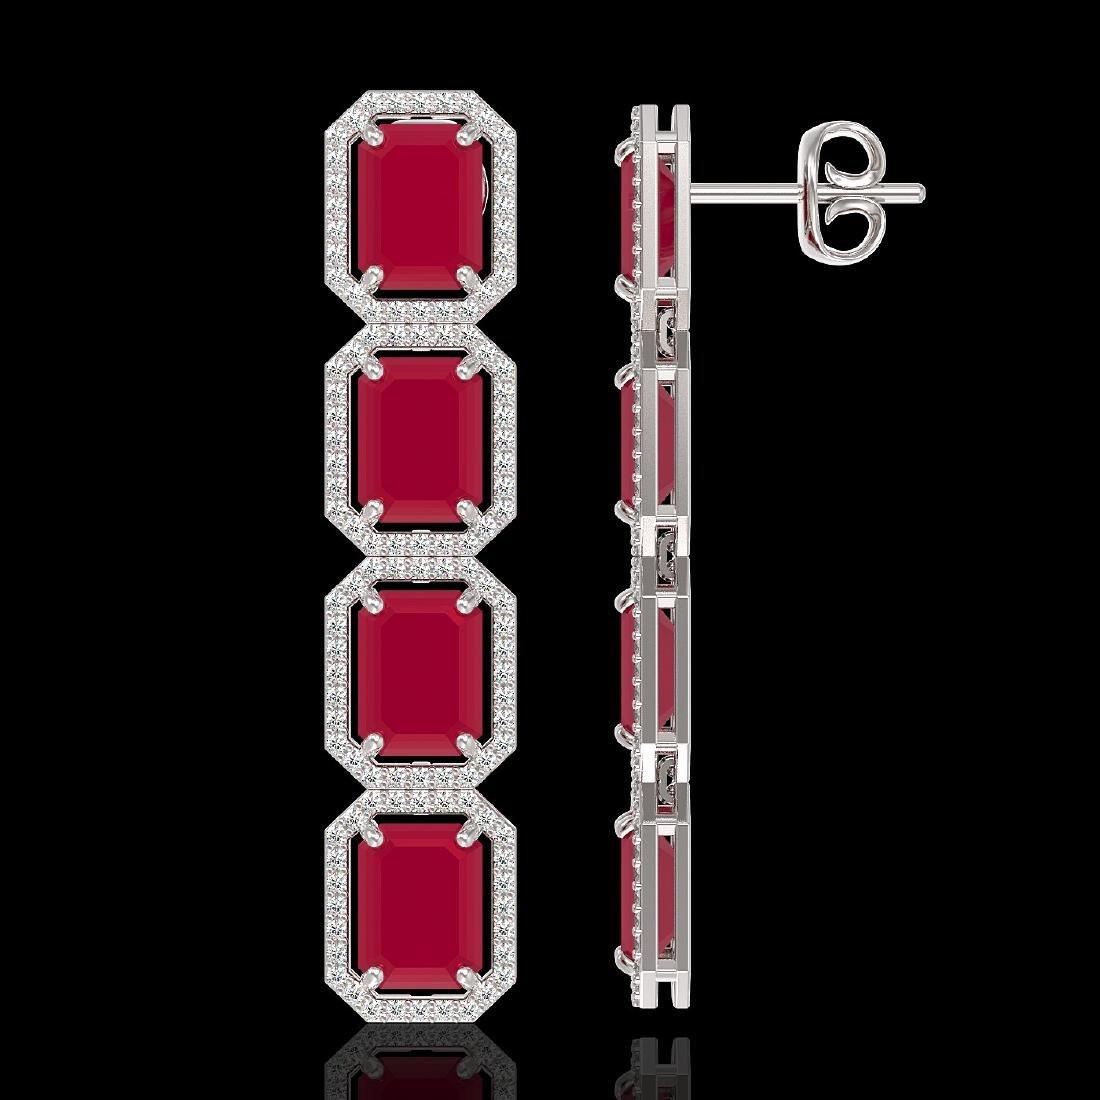 20.59 CTW Ruby & Diamond Halo Earrings 10K White Gold - 2